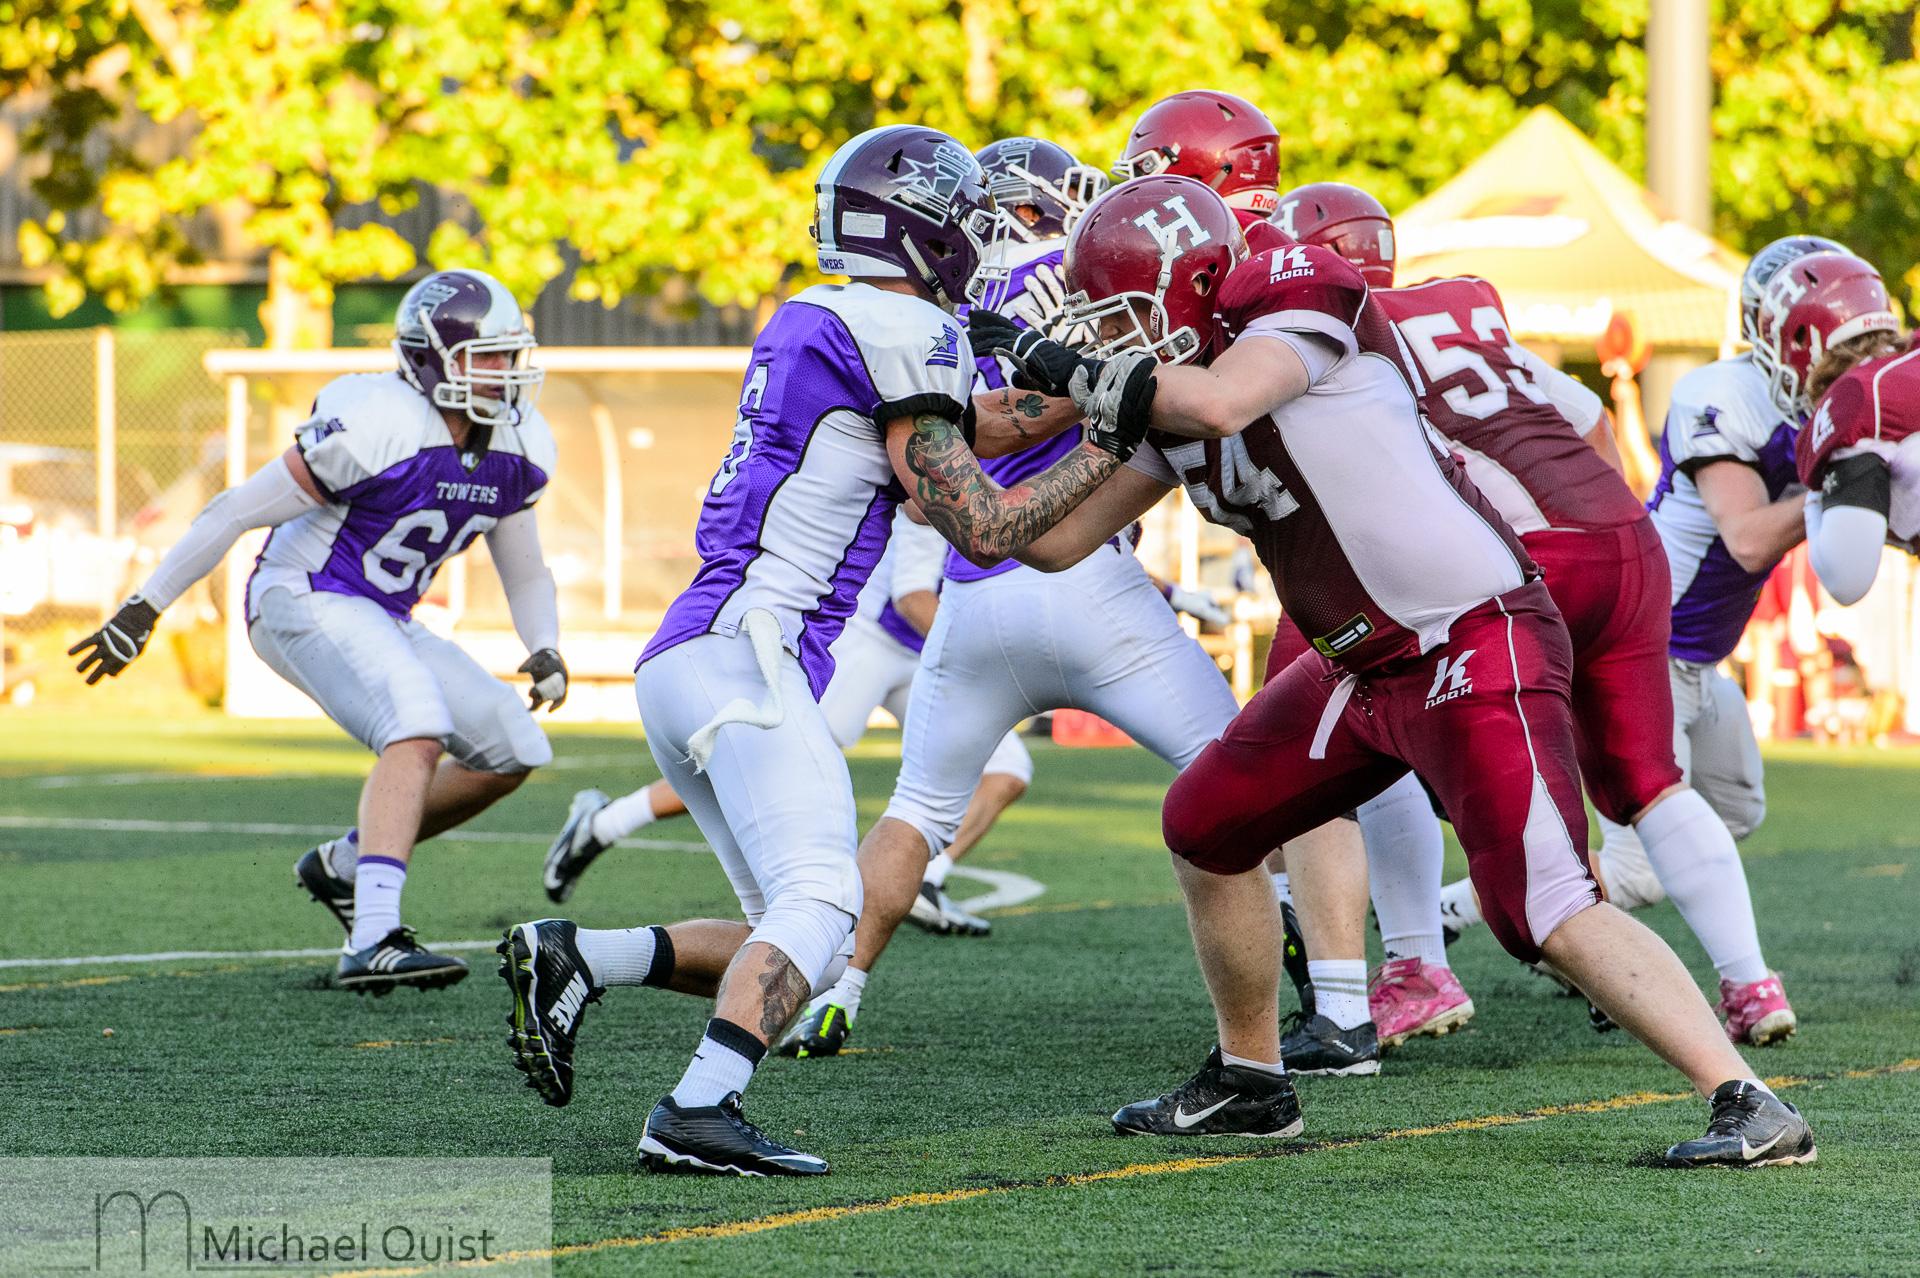 Junior-Bowl-2015-Copenhagen-Towers-vs-Herlev-Rebels-61